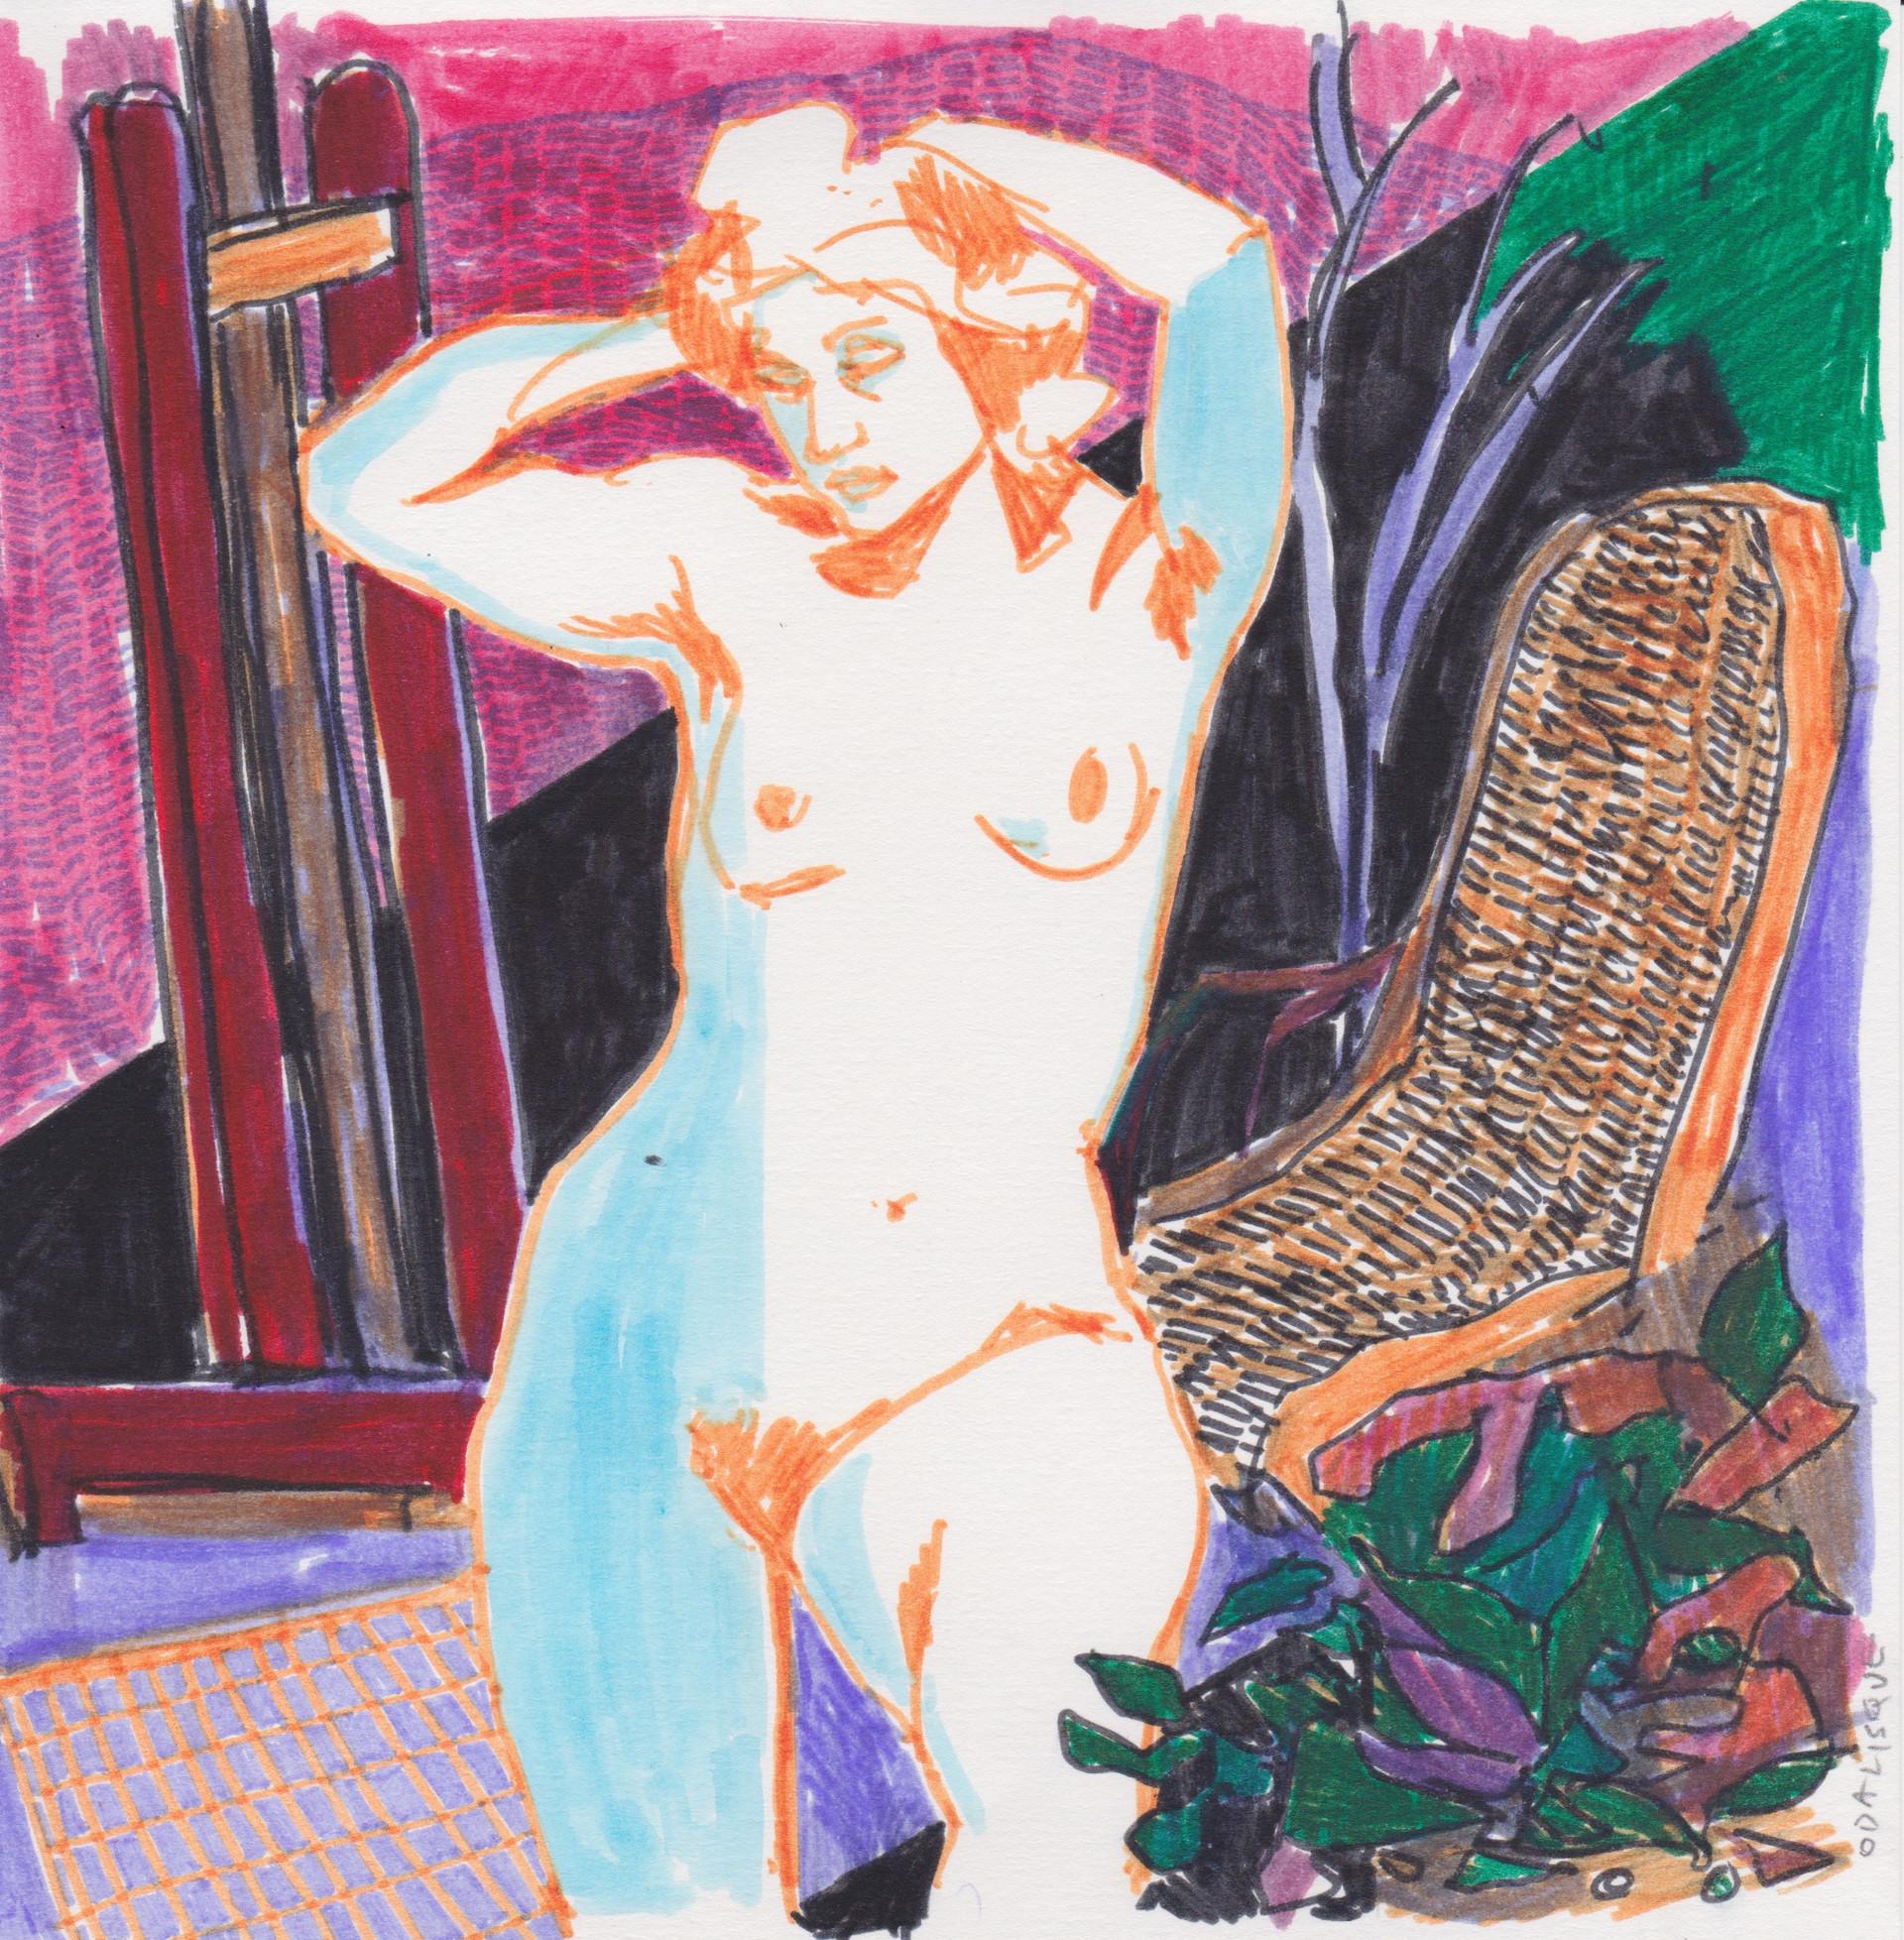 Odalisque, after Matisse